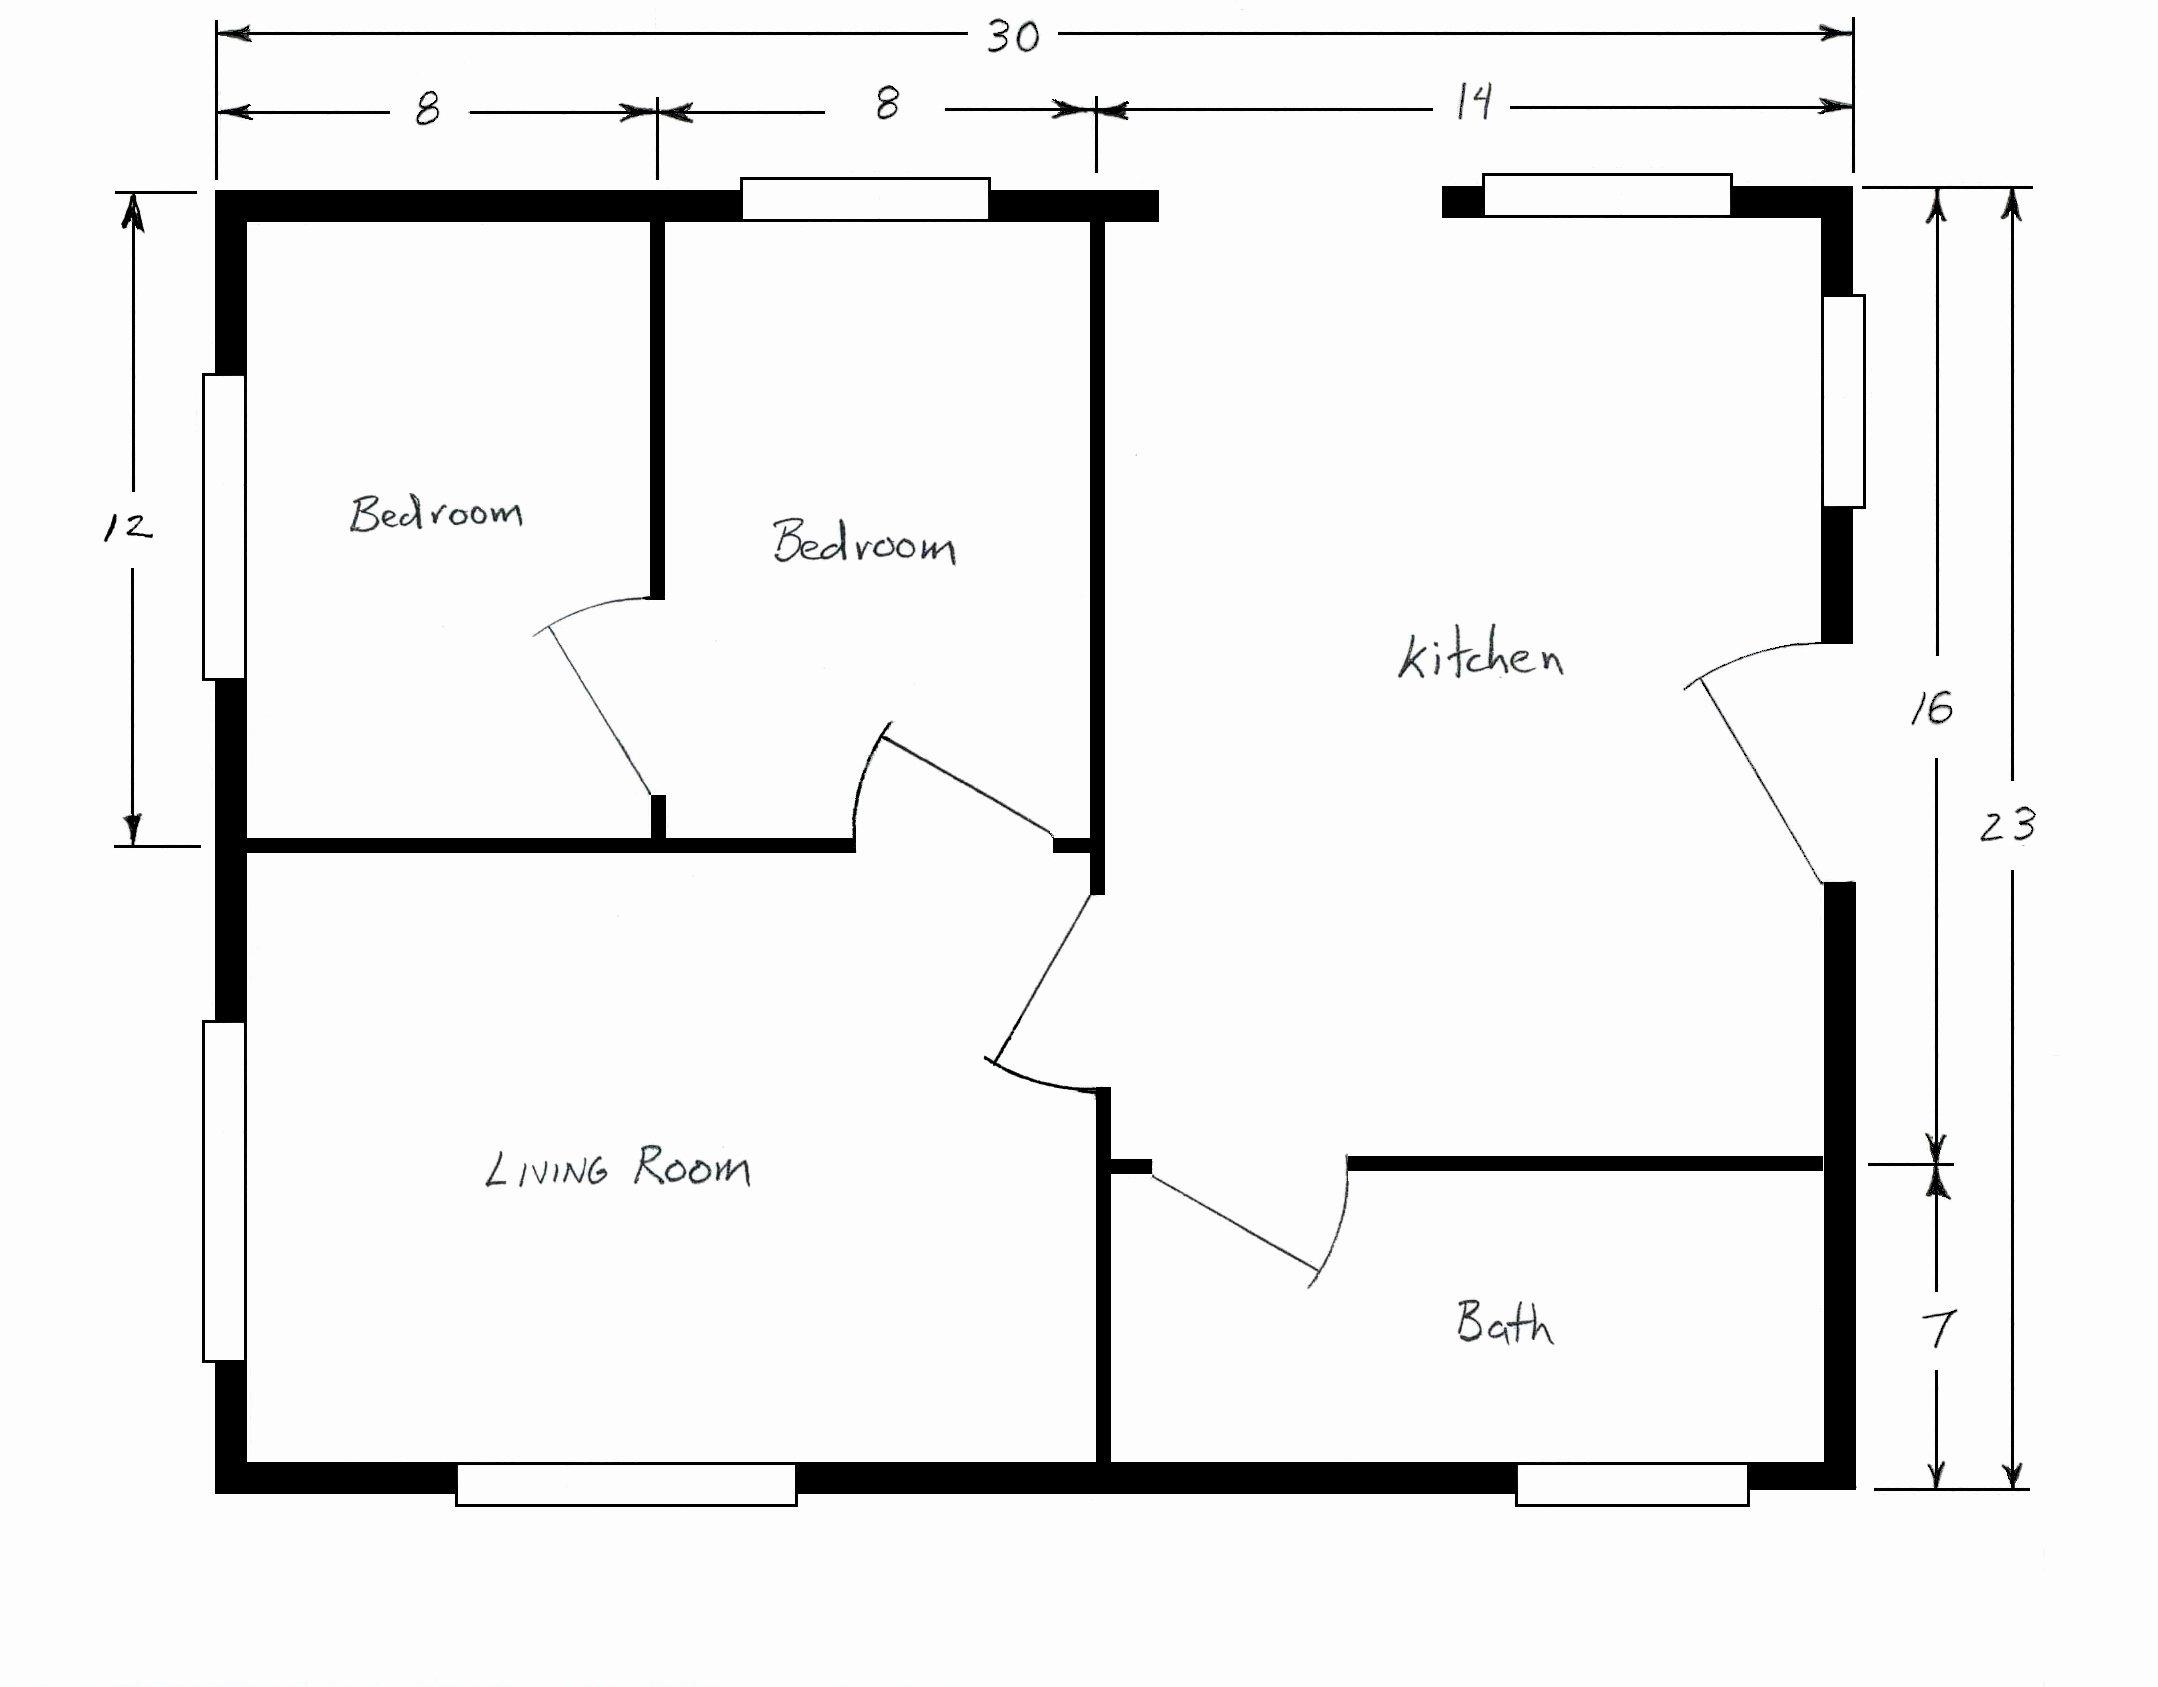 Floor Plan Templates Free Luxury Blank House Floor Plan Template Details Floorplan House